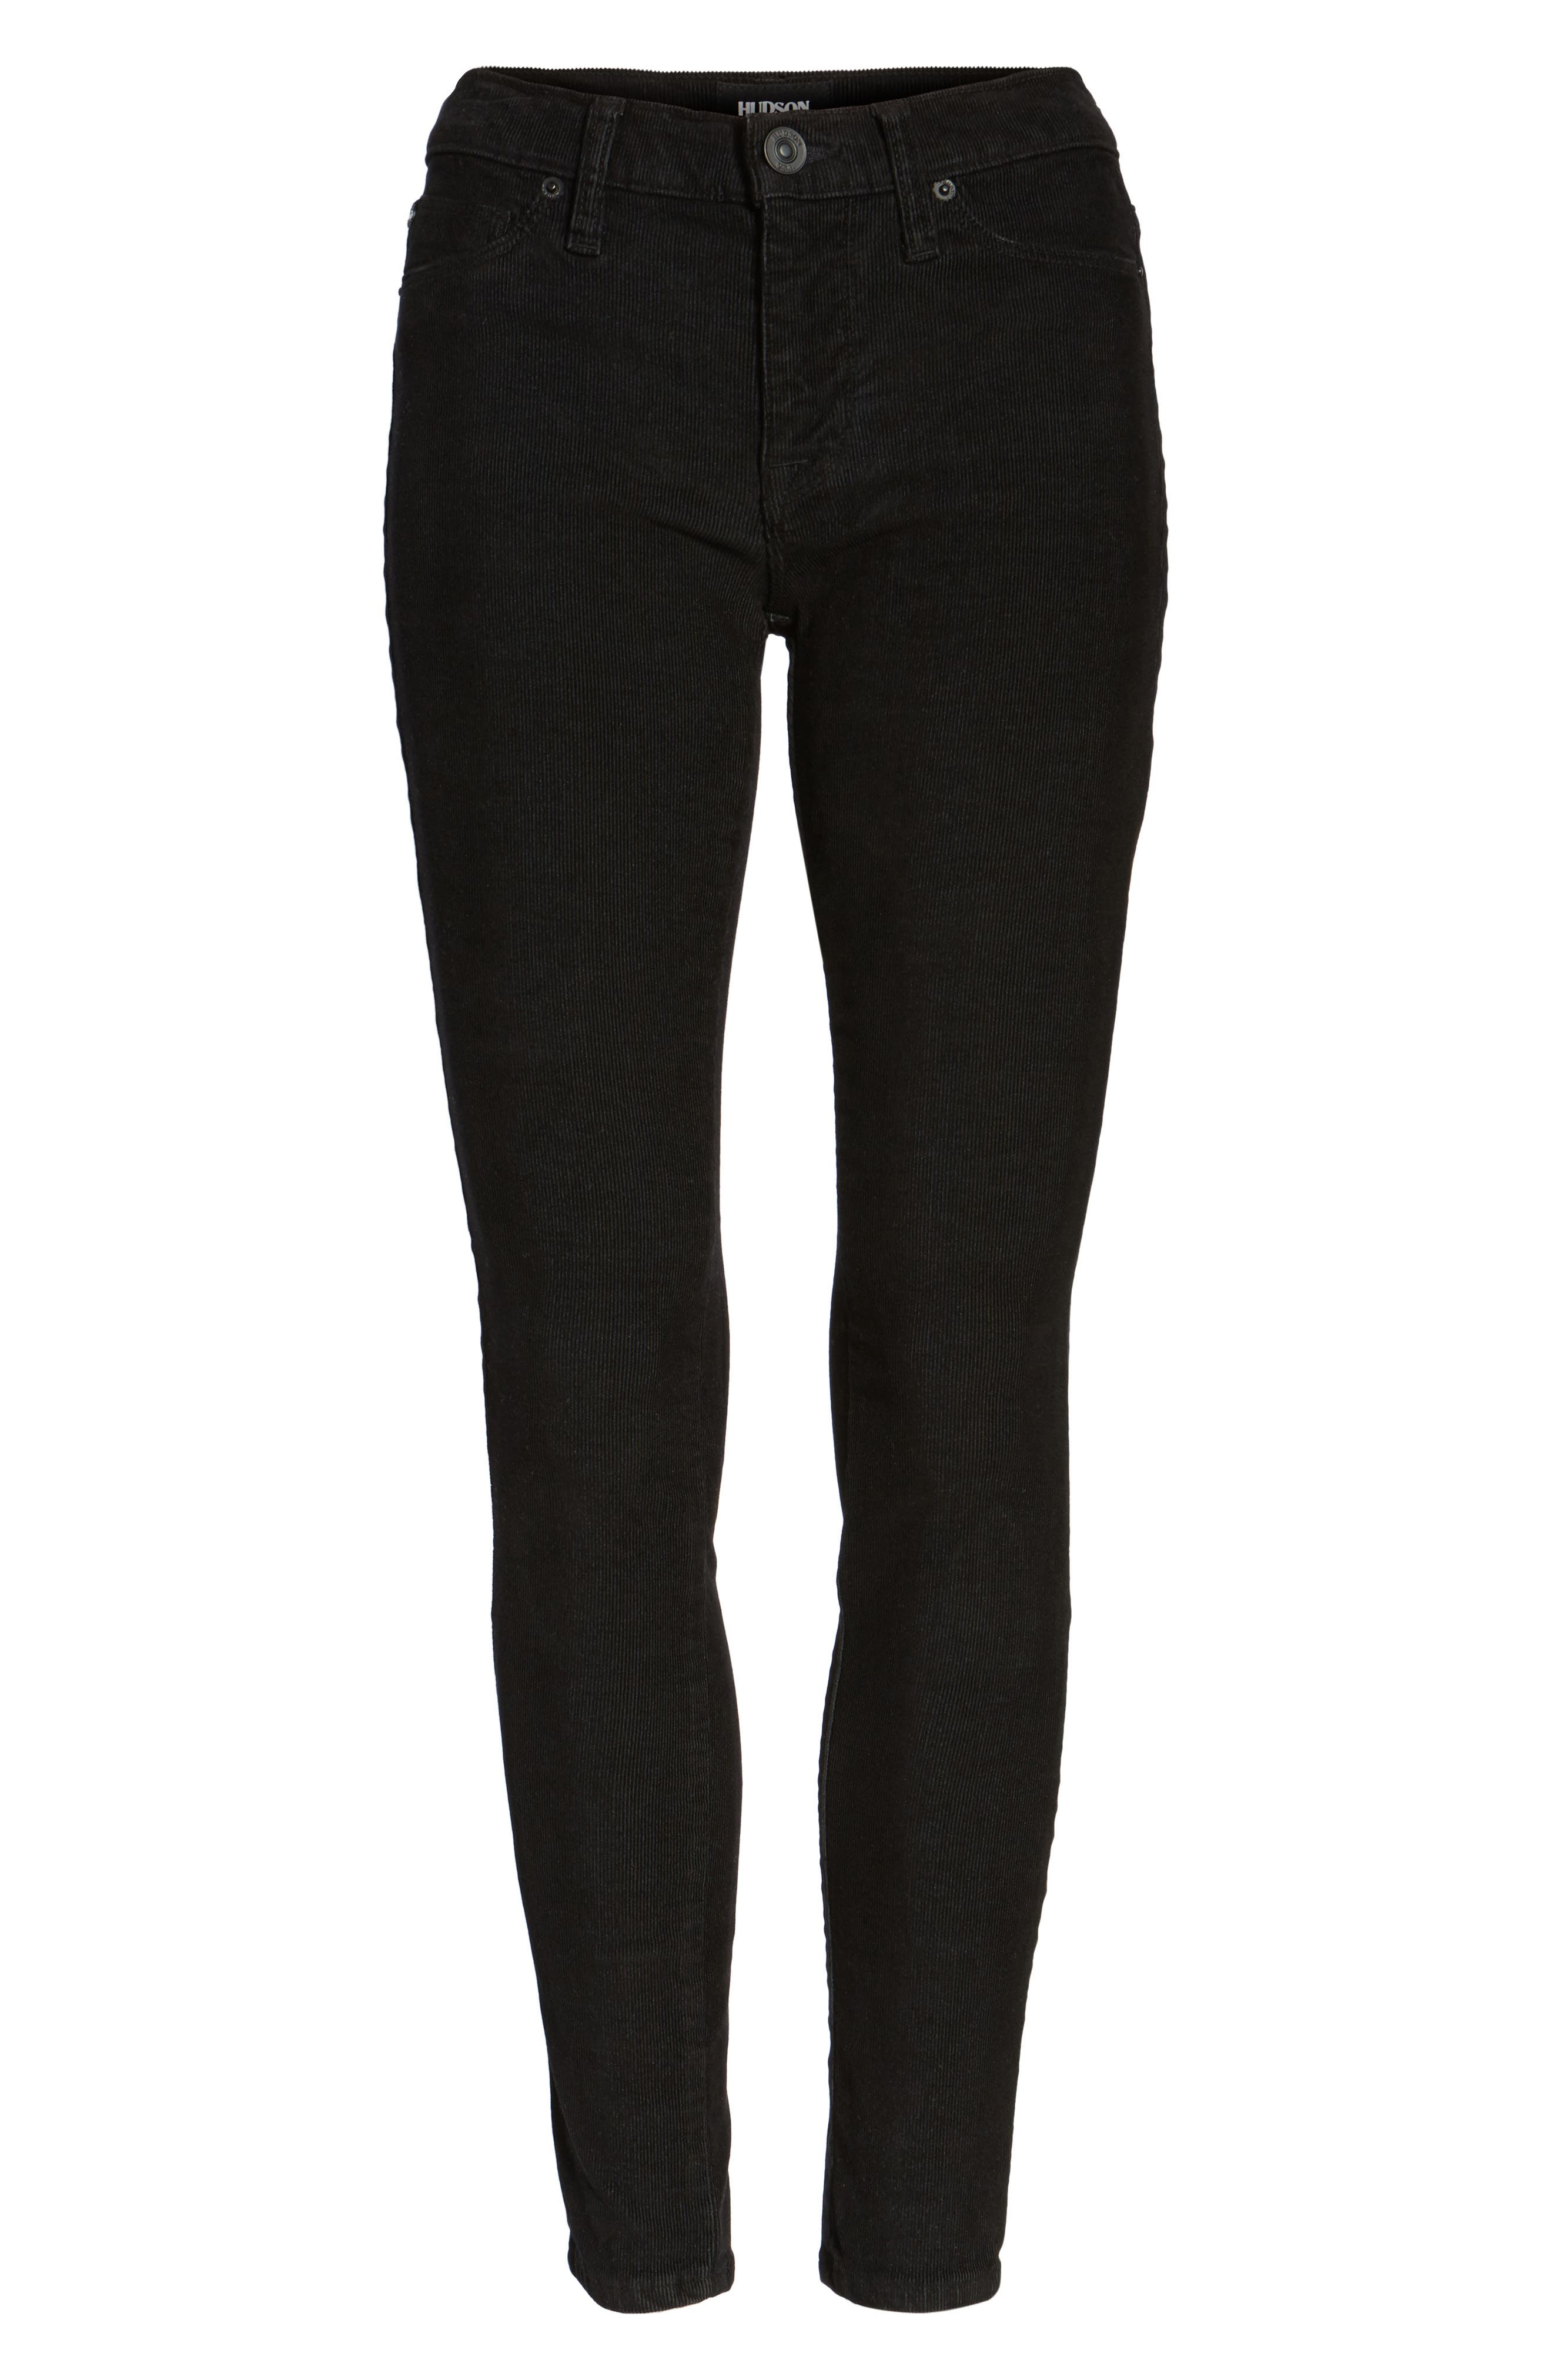 Nico Ankle Super Skinny Corduroy Pants,                             Alternate thumbnail 6, color,                             001